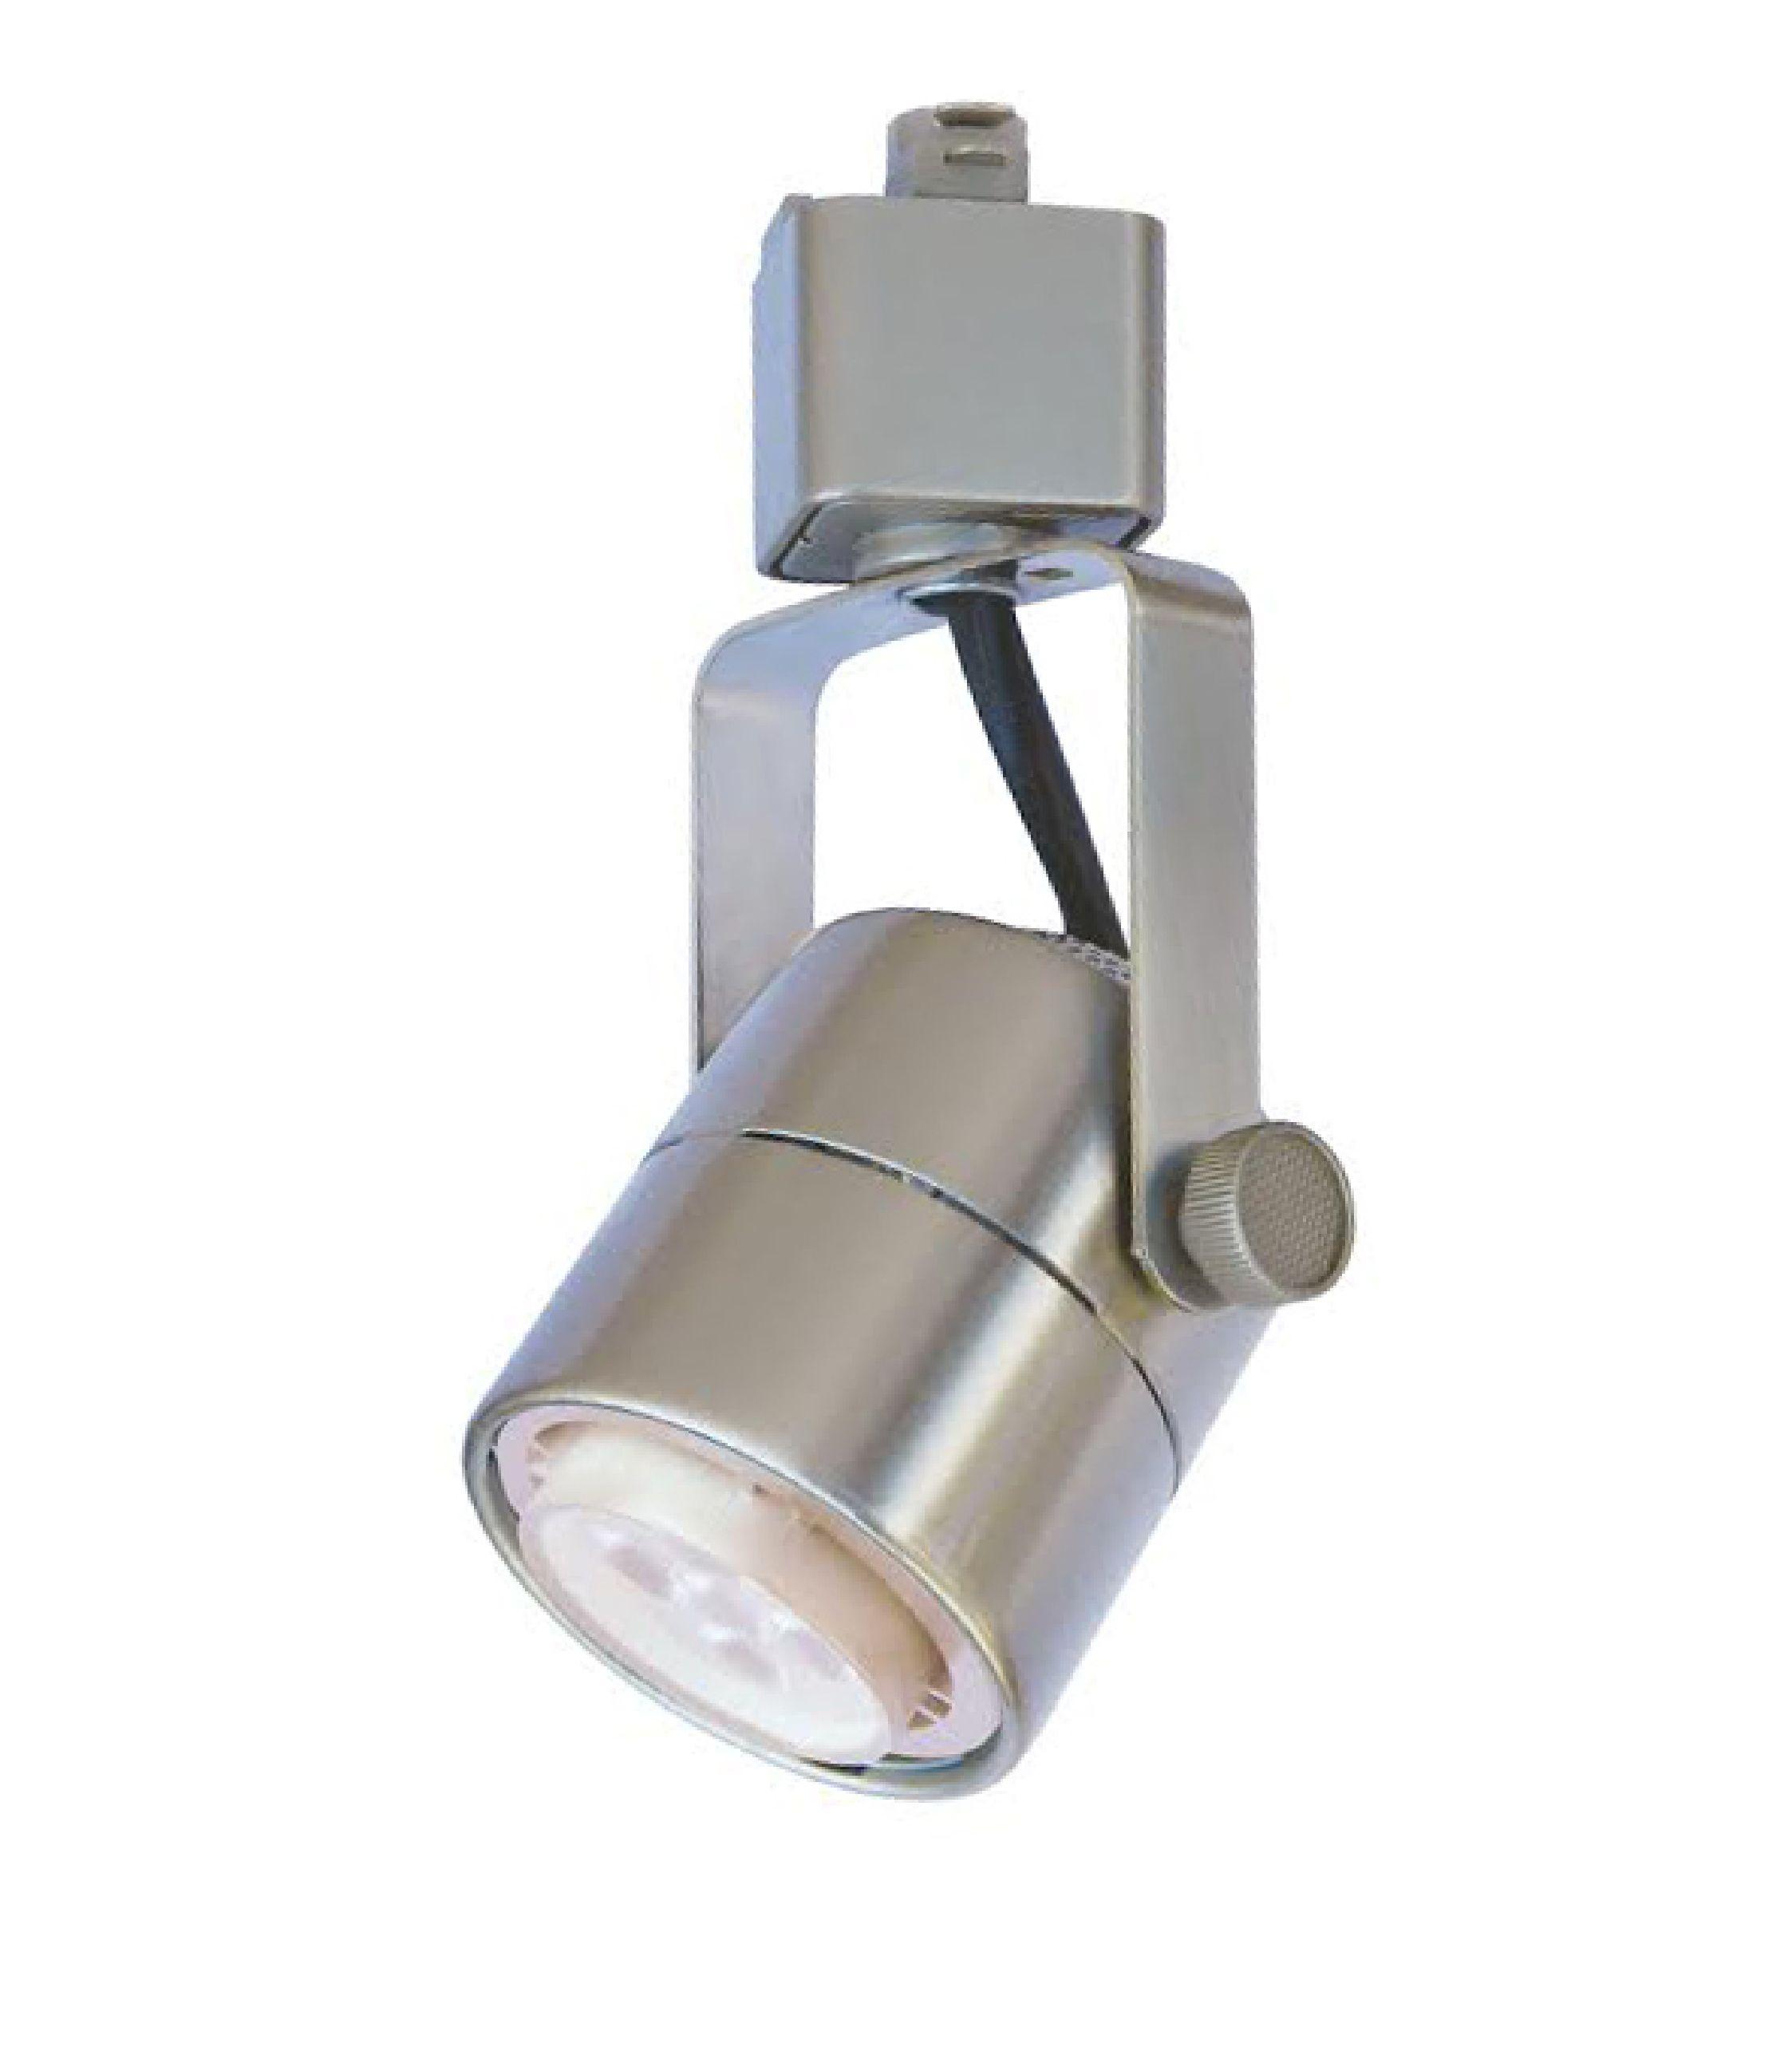 Alcon lighting mini cylinder 13110 adjustable swivel head led track alcon lighting mini cylinder 13110 adjustable swivel head led track light fixture 120v mozeypictures Gallery